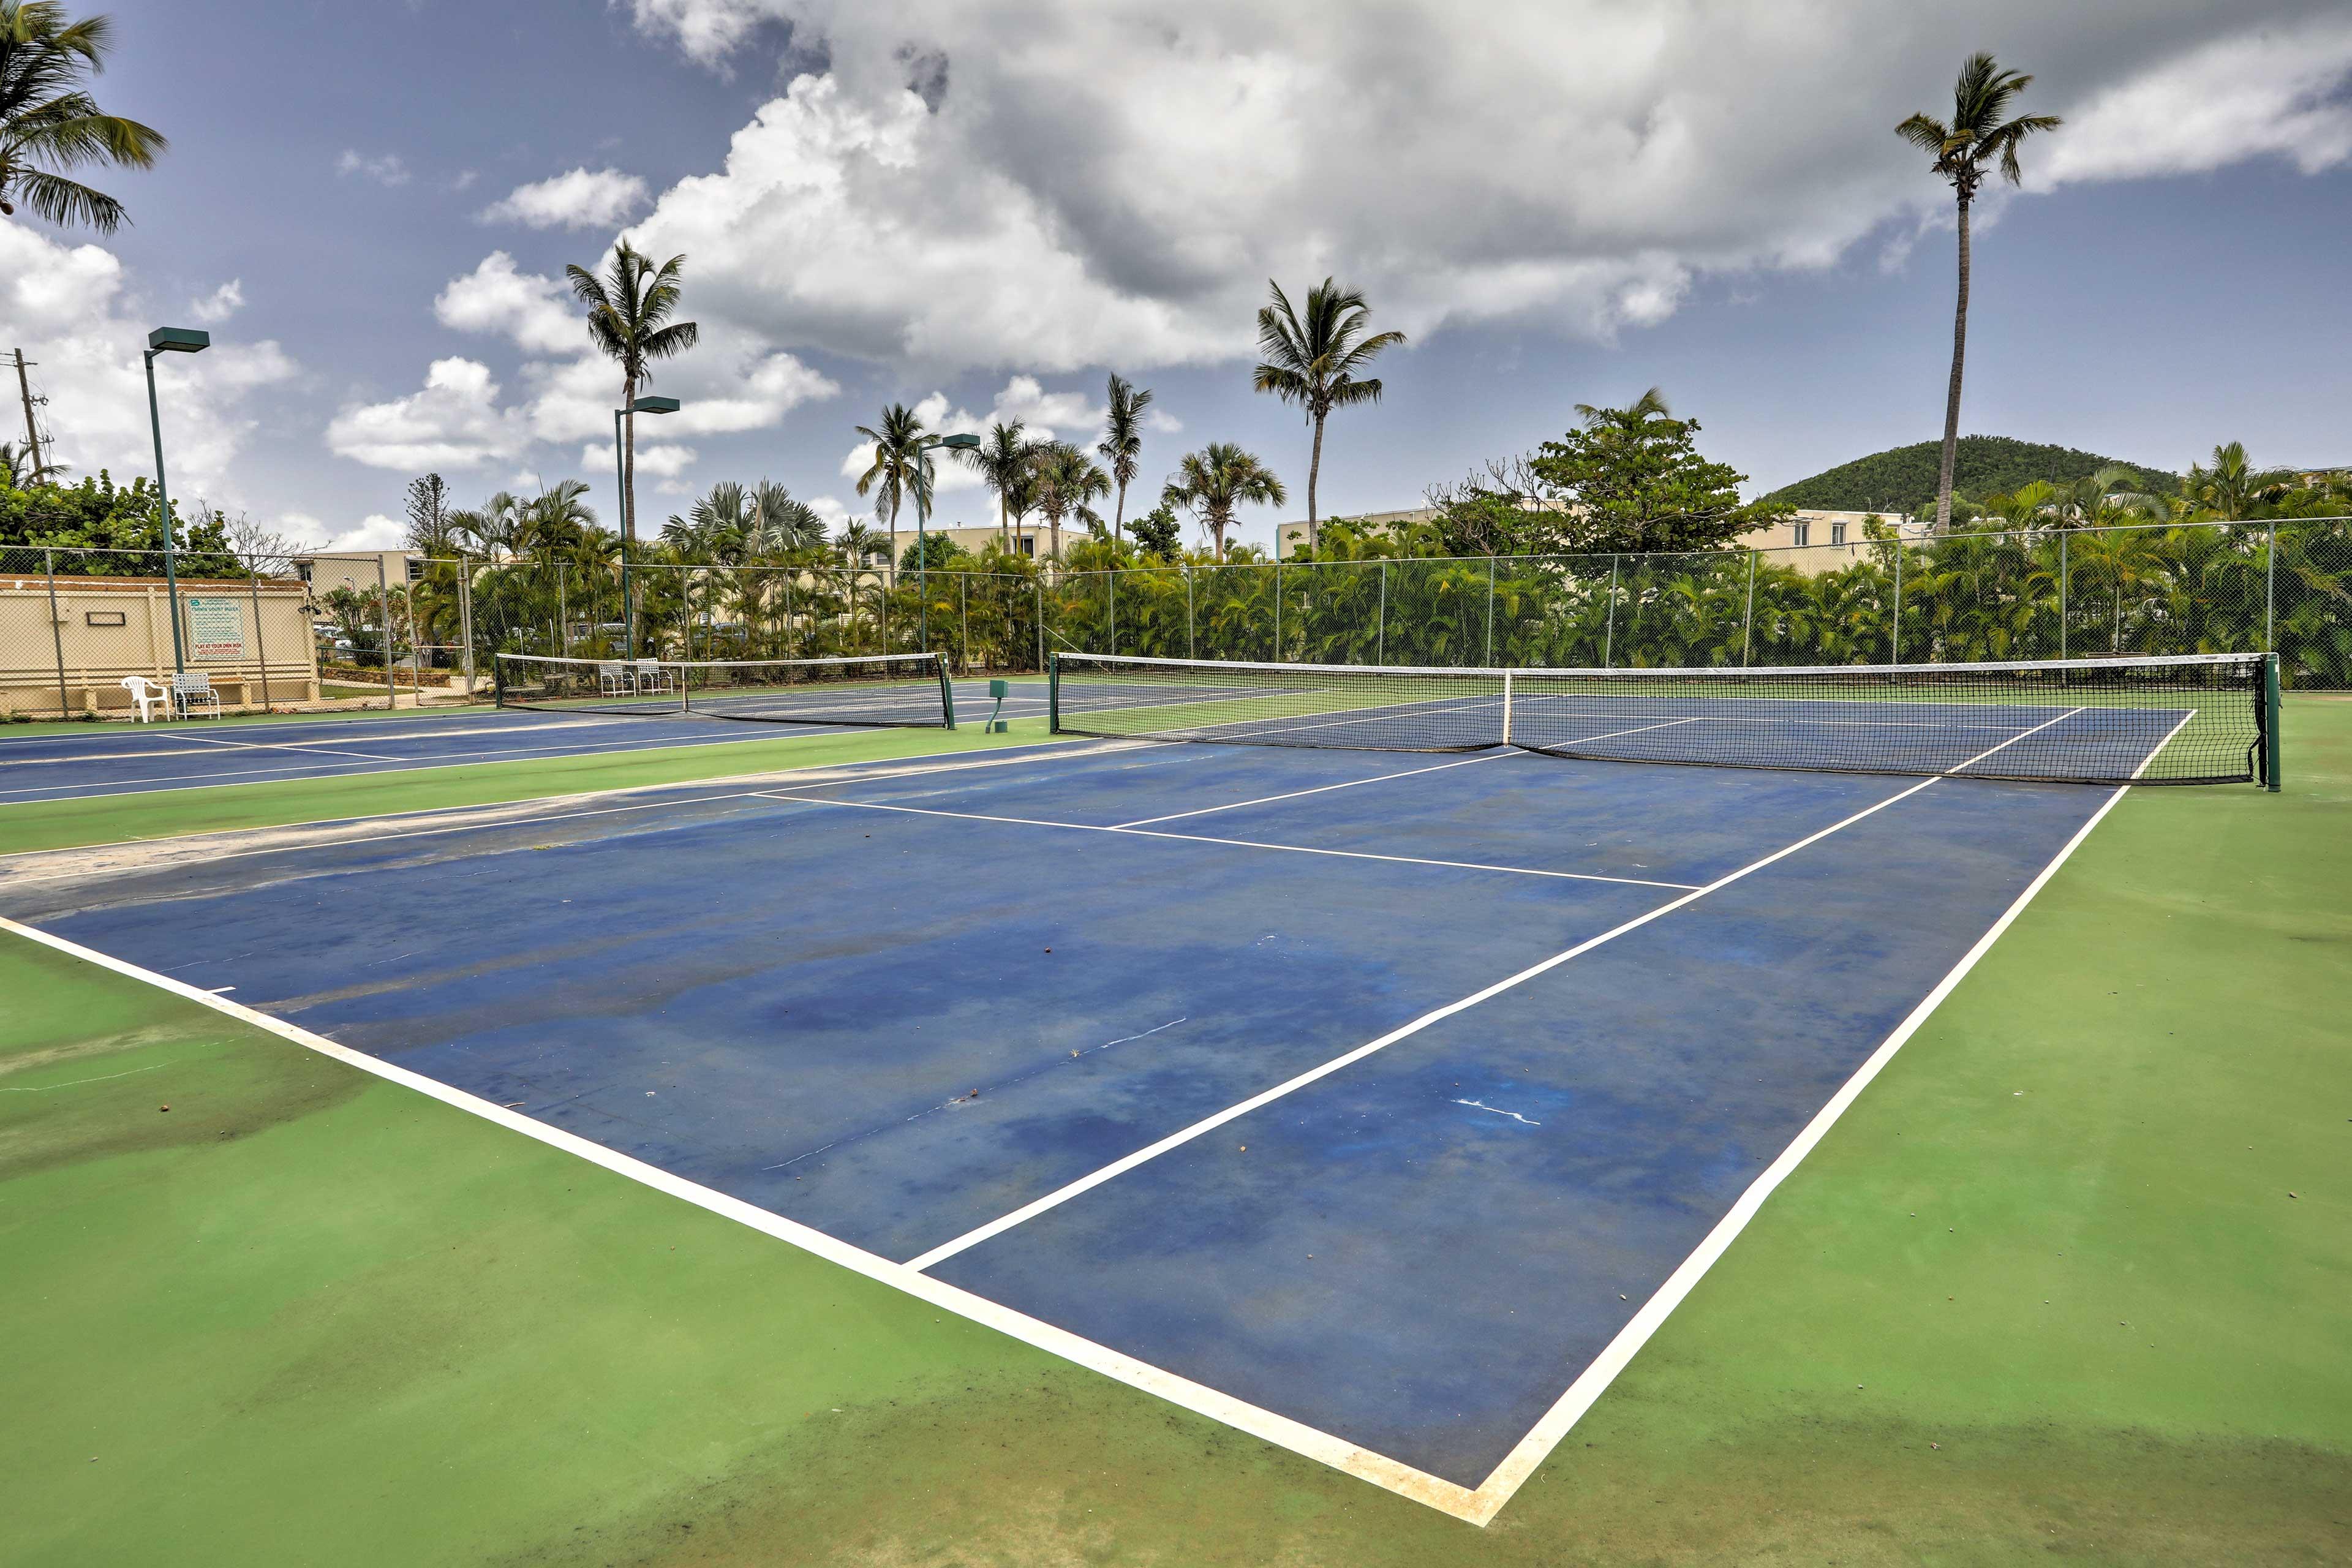 Tennis match anyone?